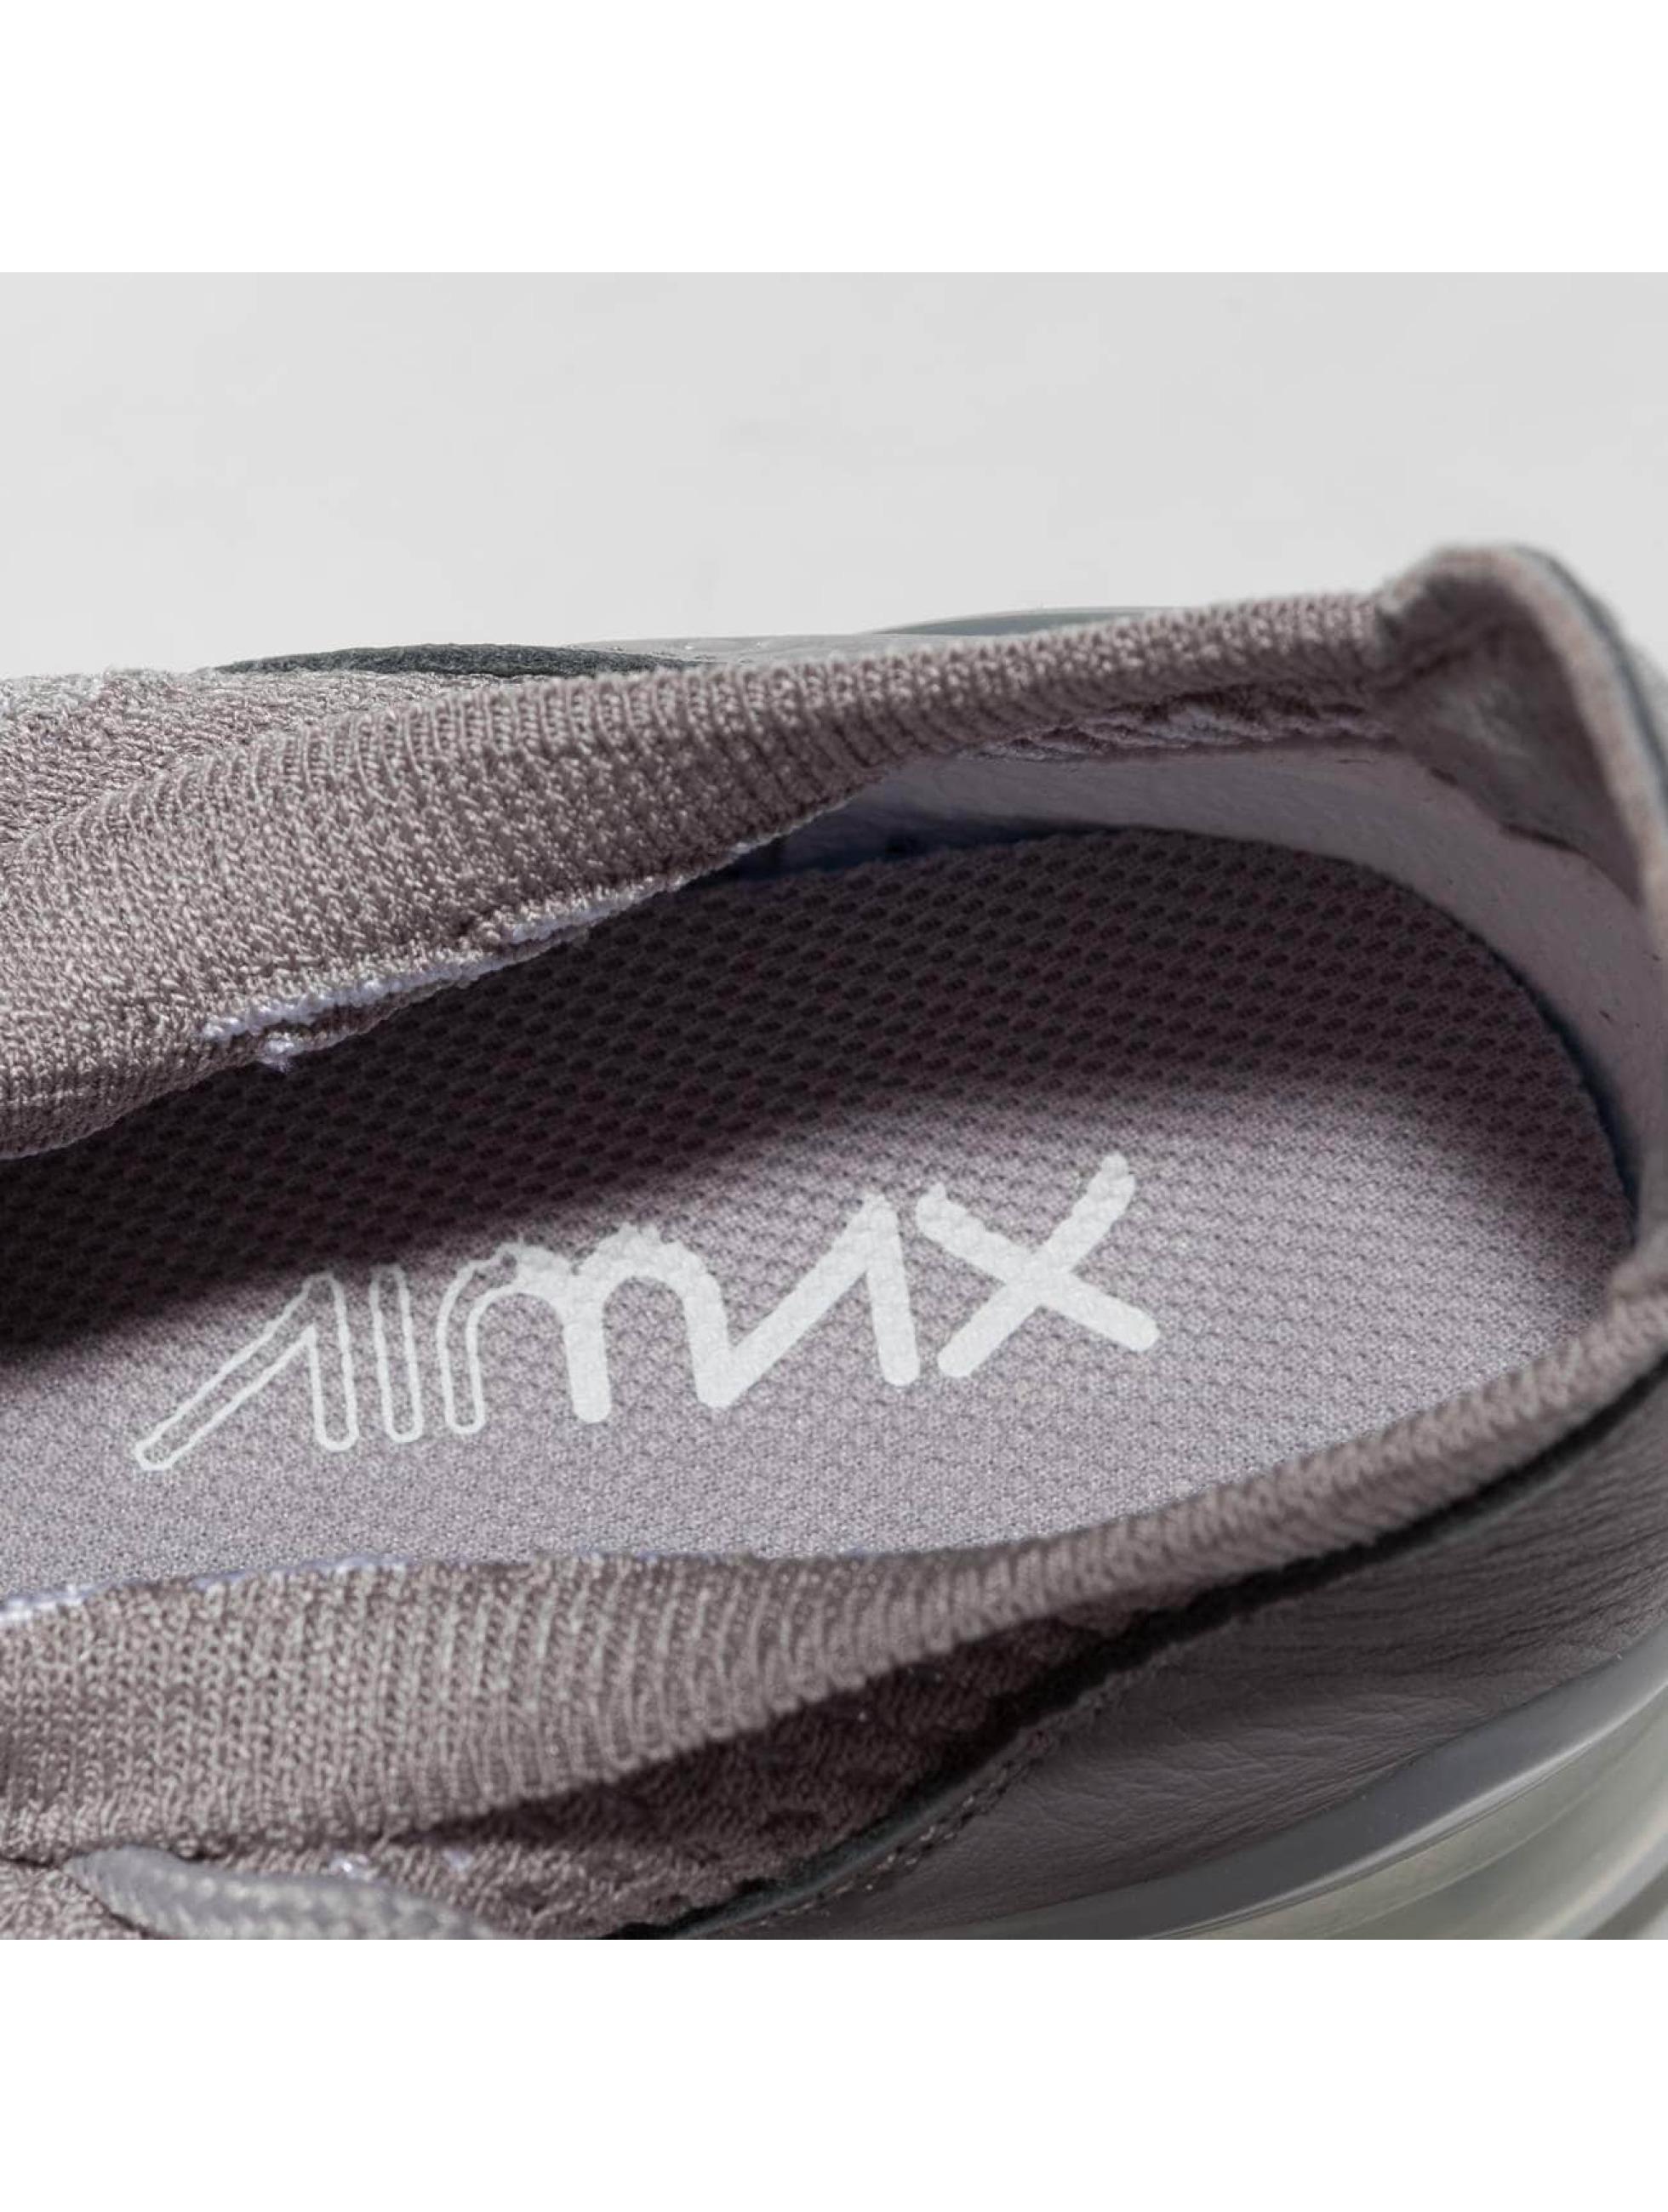 Nike Zapatillas de deporte Air Max 270 Flyknit gris